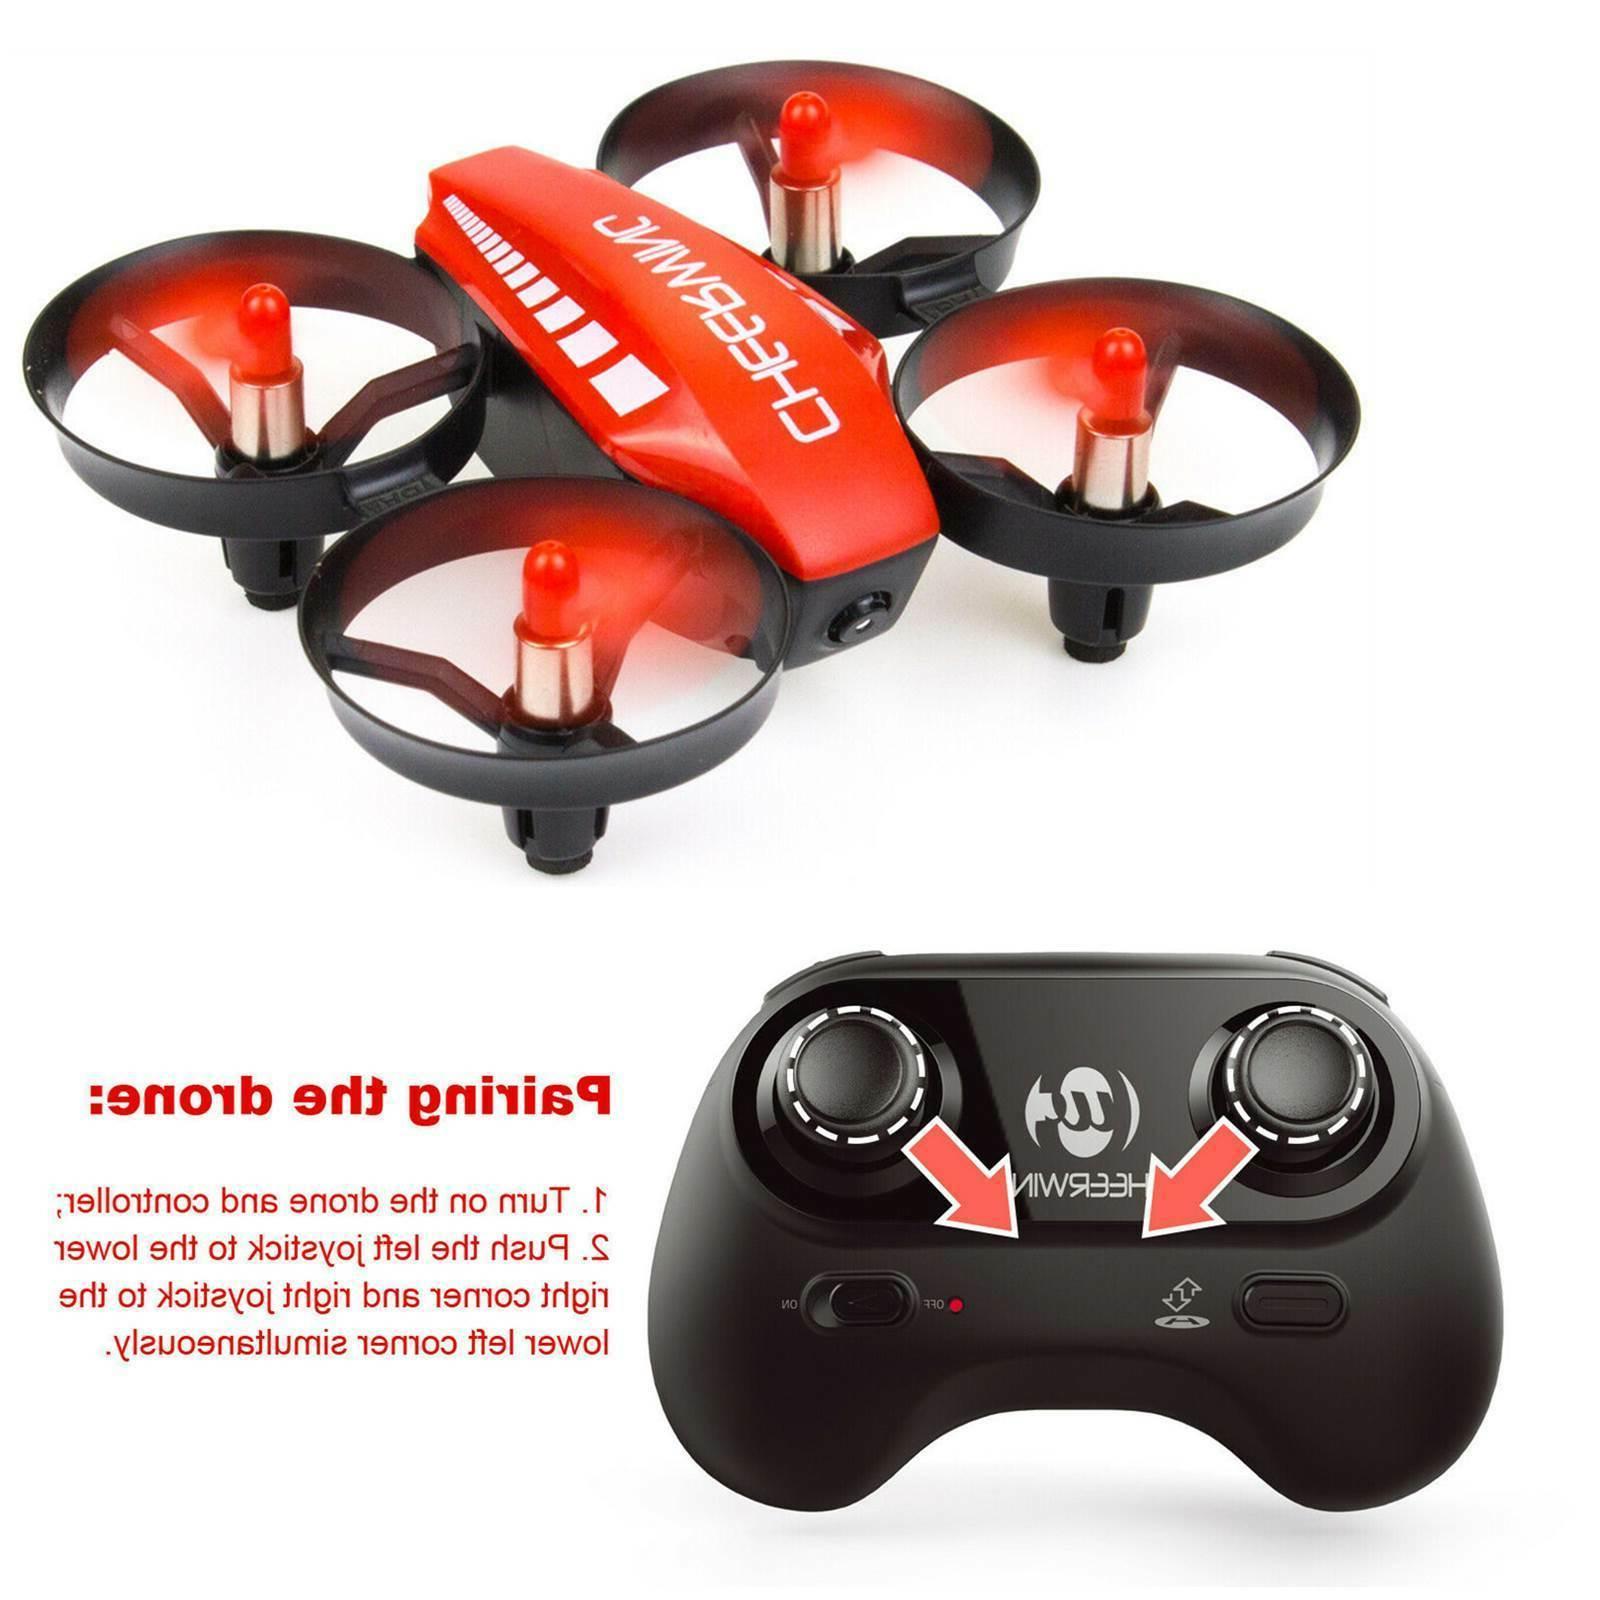 UDI U28W RC Quadcopter Drone Wifi FPV 2.4G 4CH Headless With